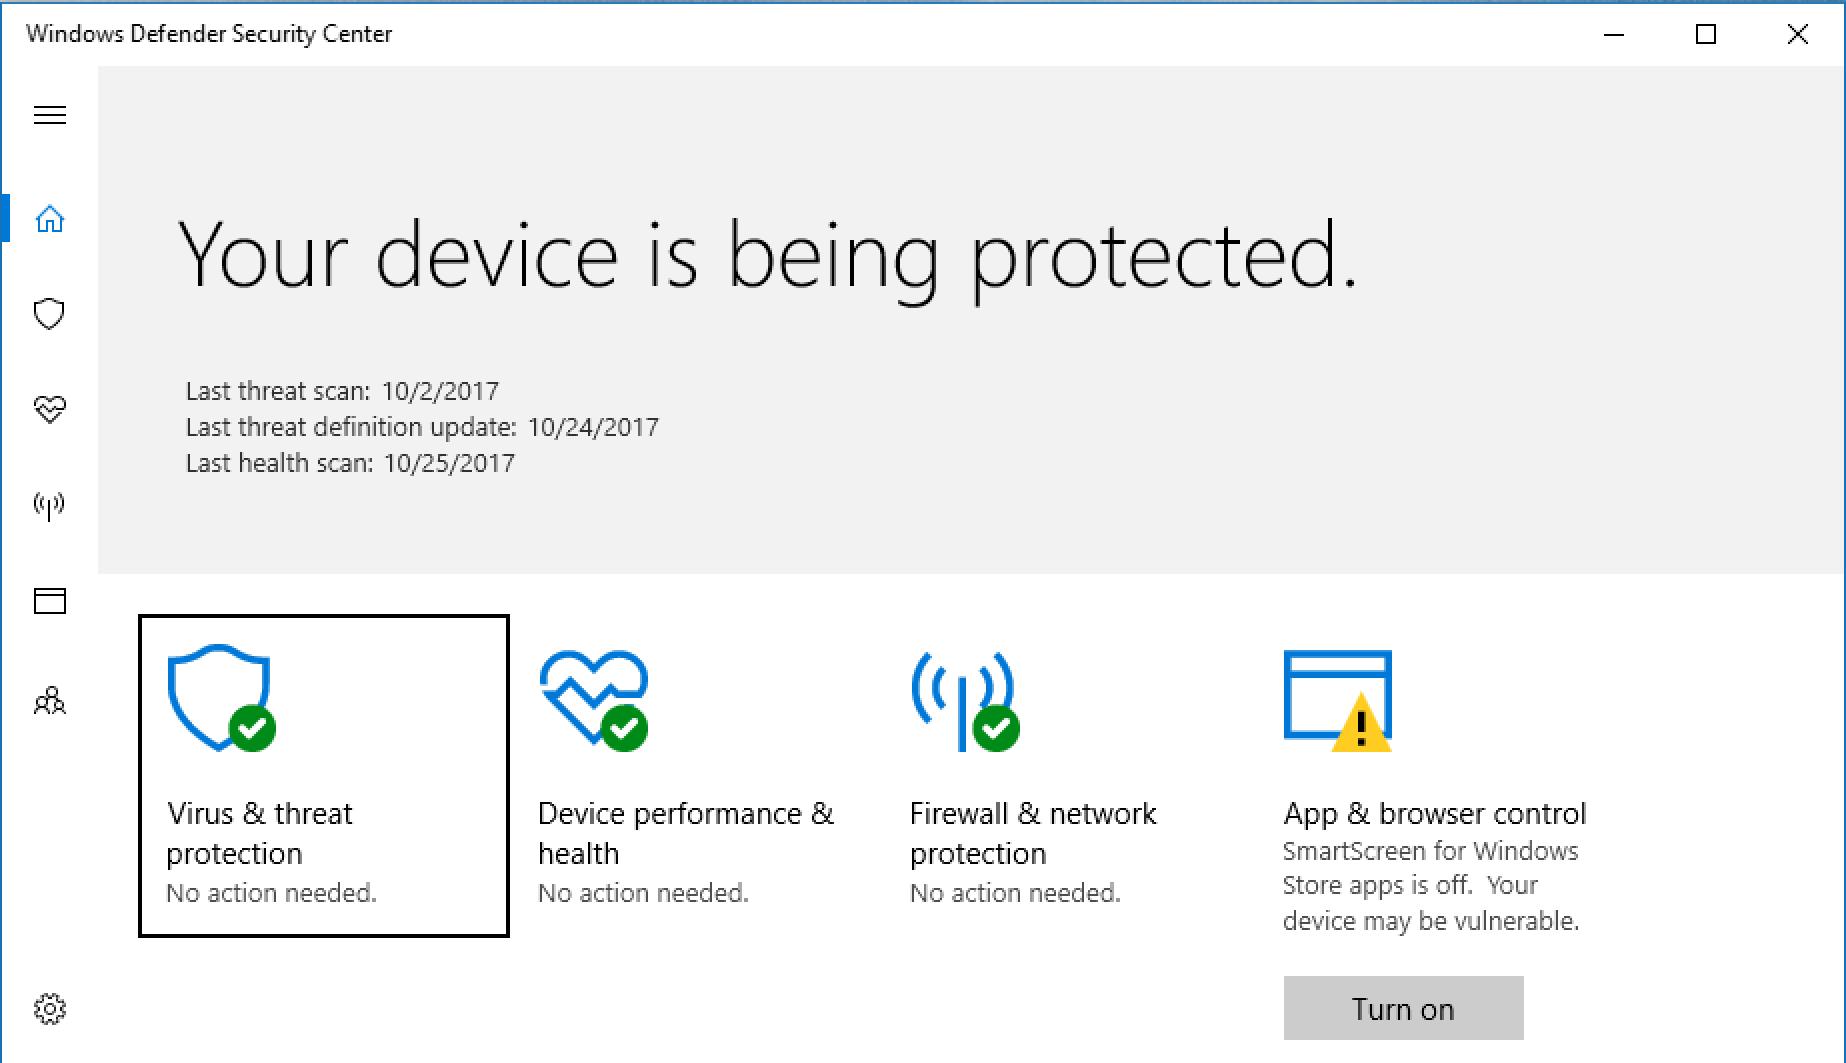 windows defender settings screen